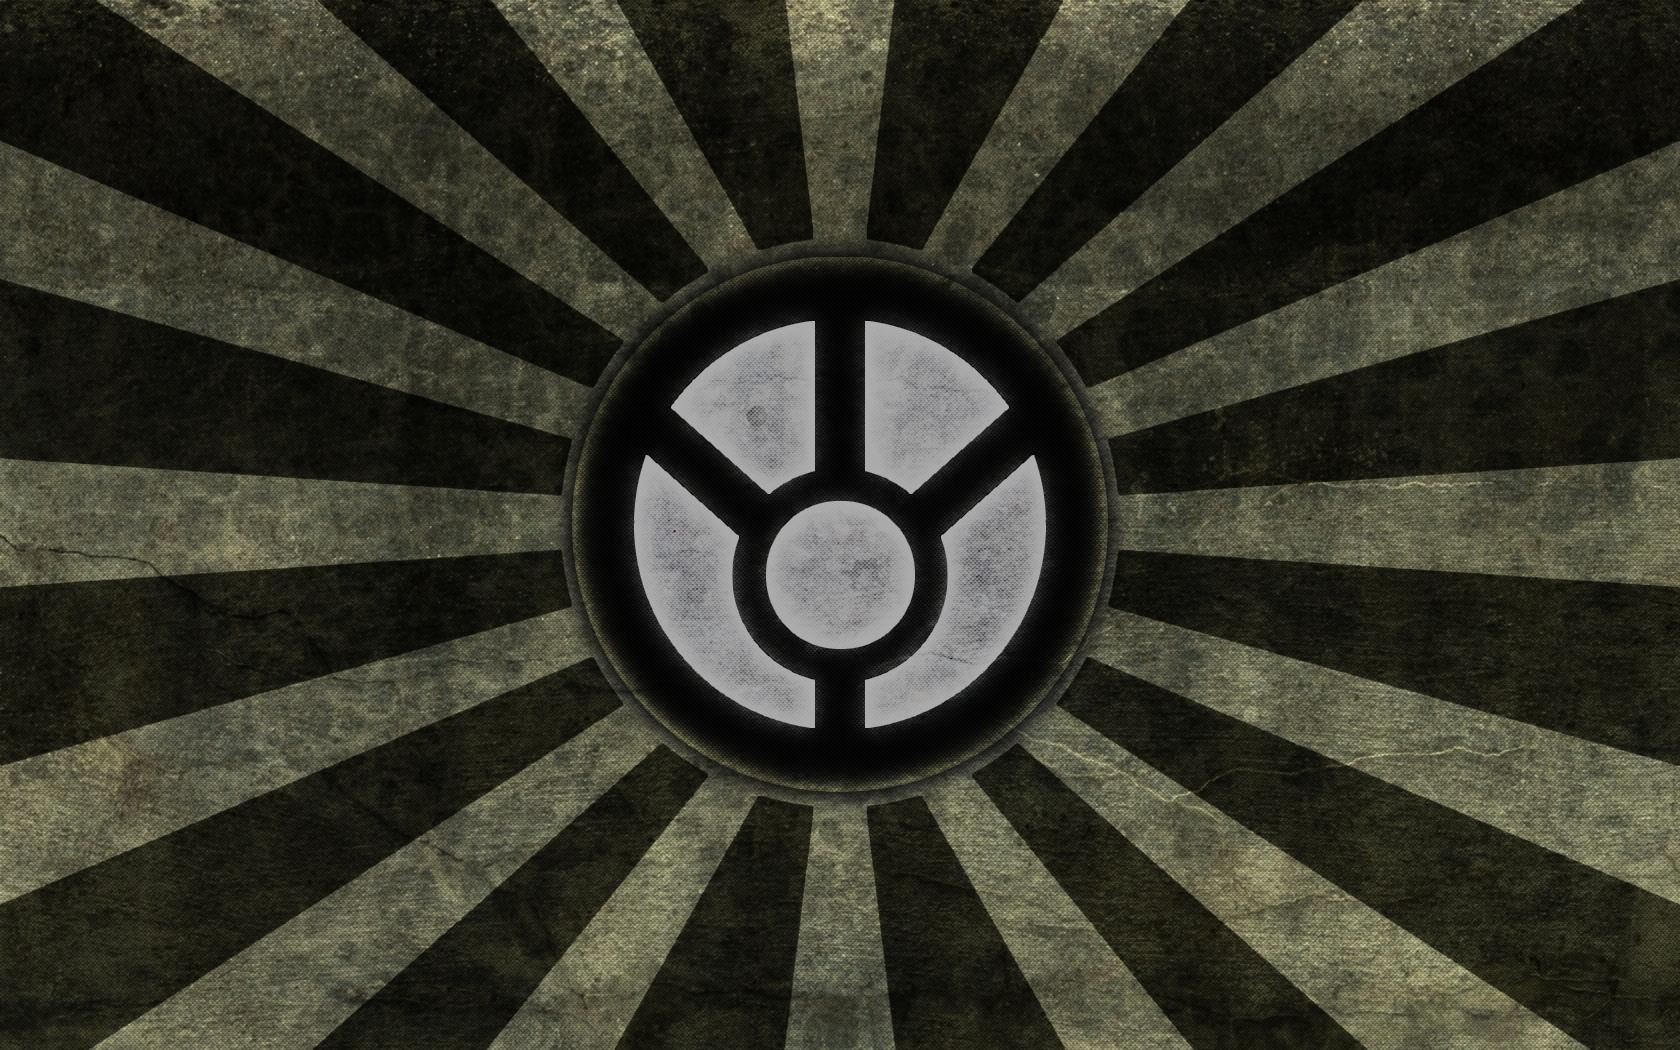 Grey Lanterns Wallpaper by LordShenlong